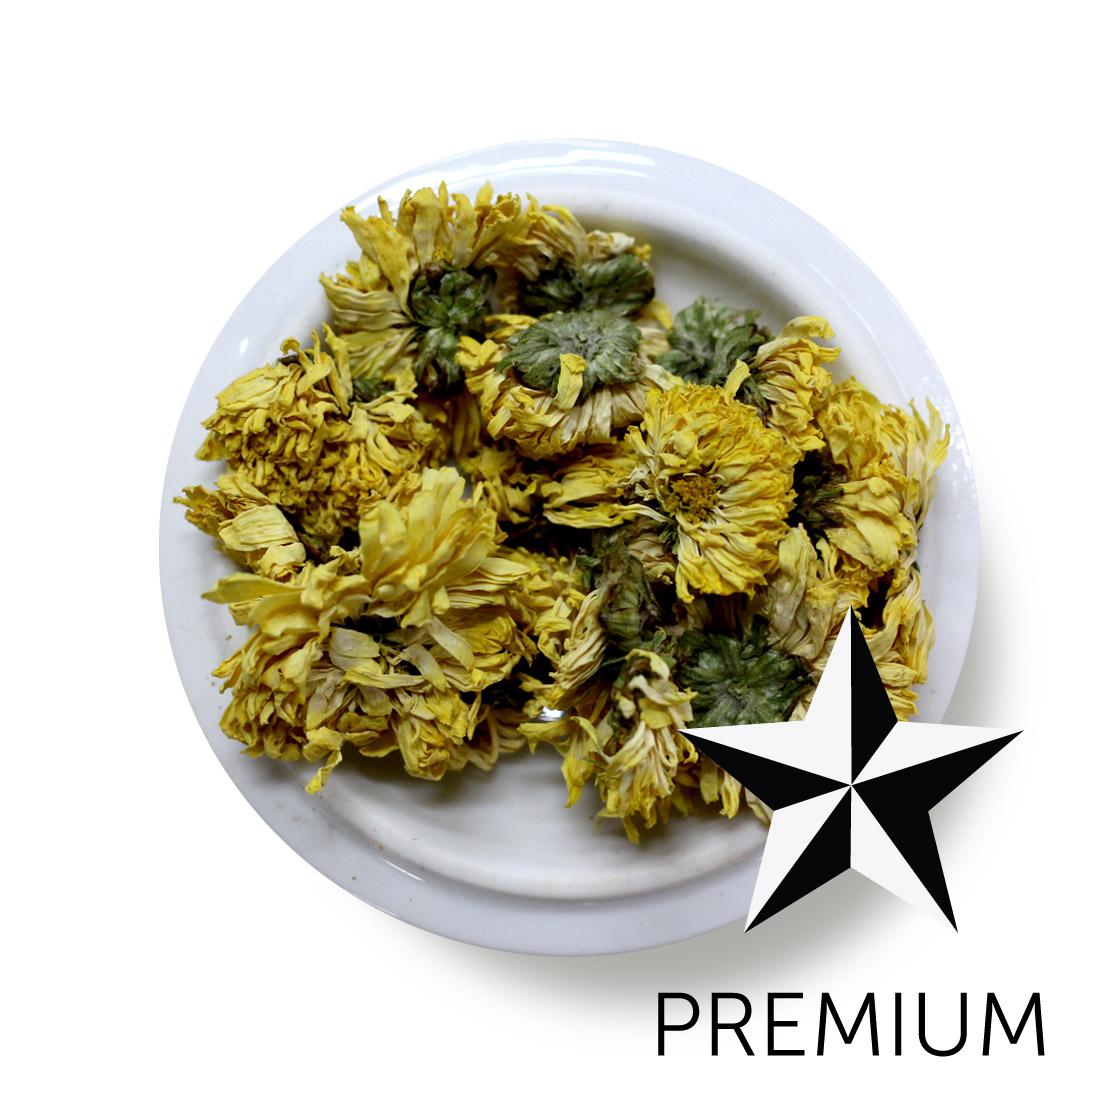 Premium Herbal Tea Chrysanthemum Buds